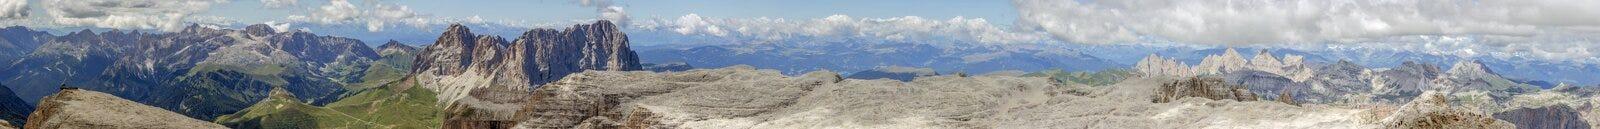 Sella-Bergpanorama von Piz Boe Lizenzfreie Stockfotografie